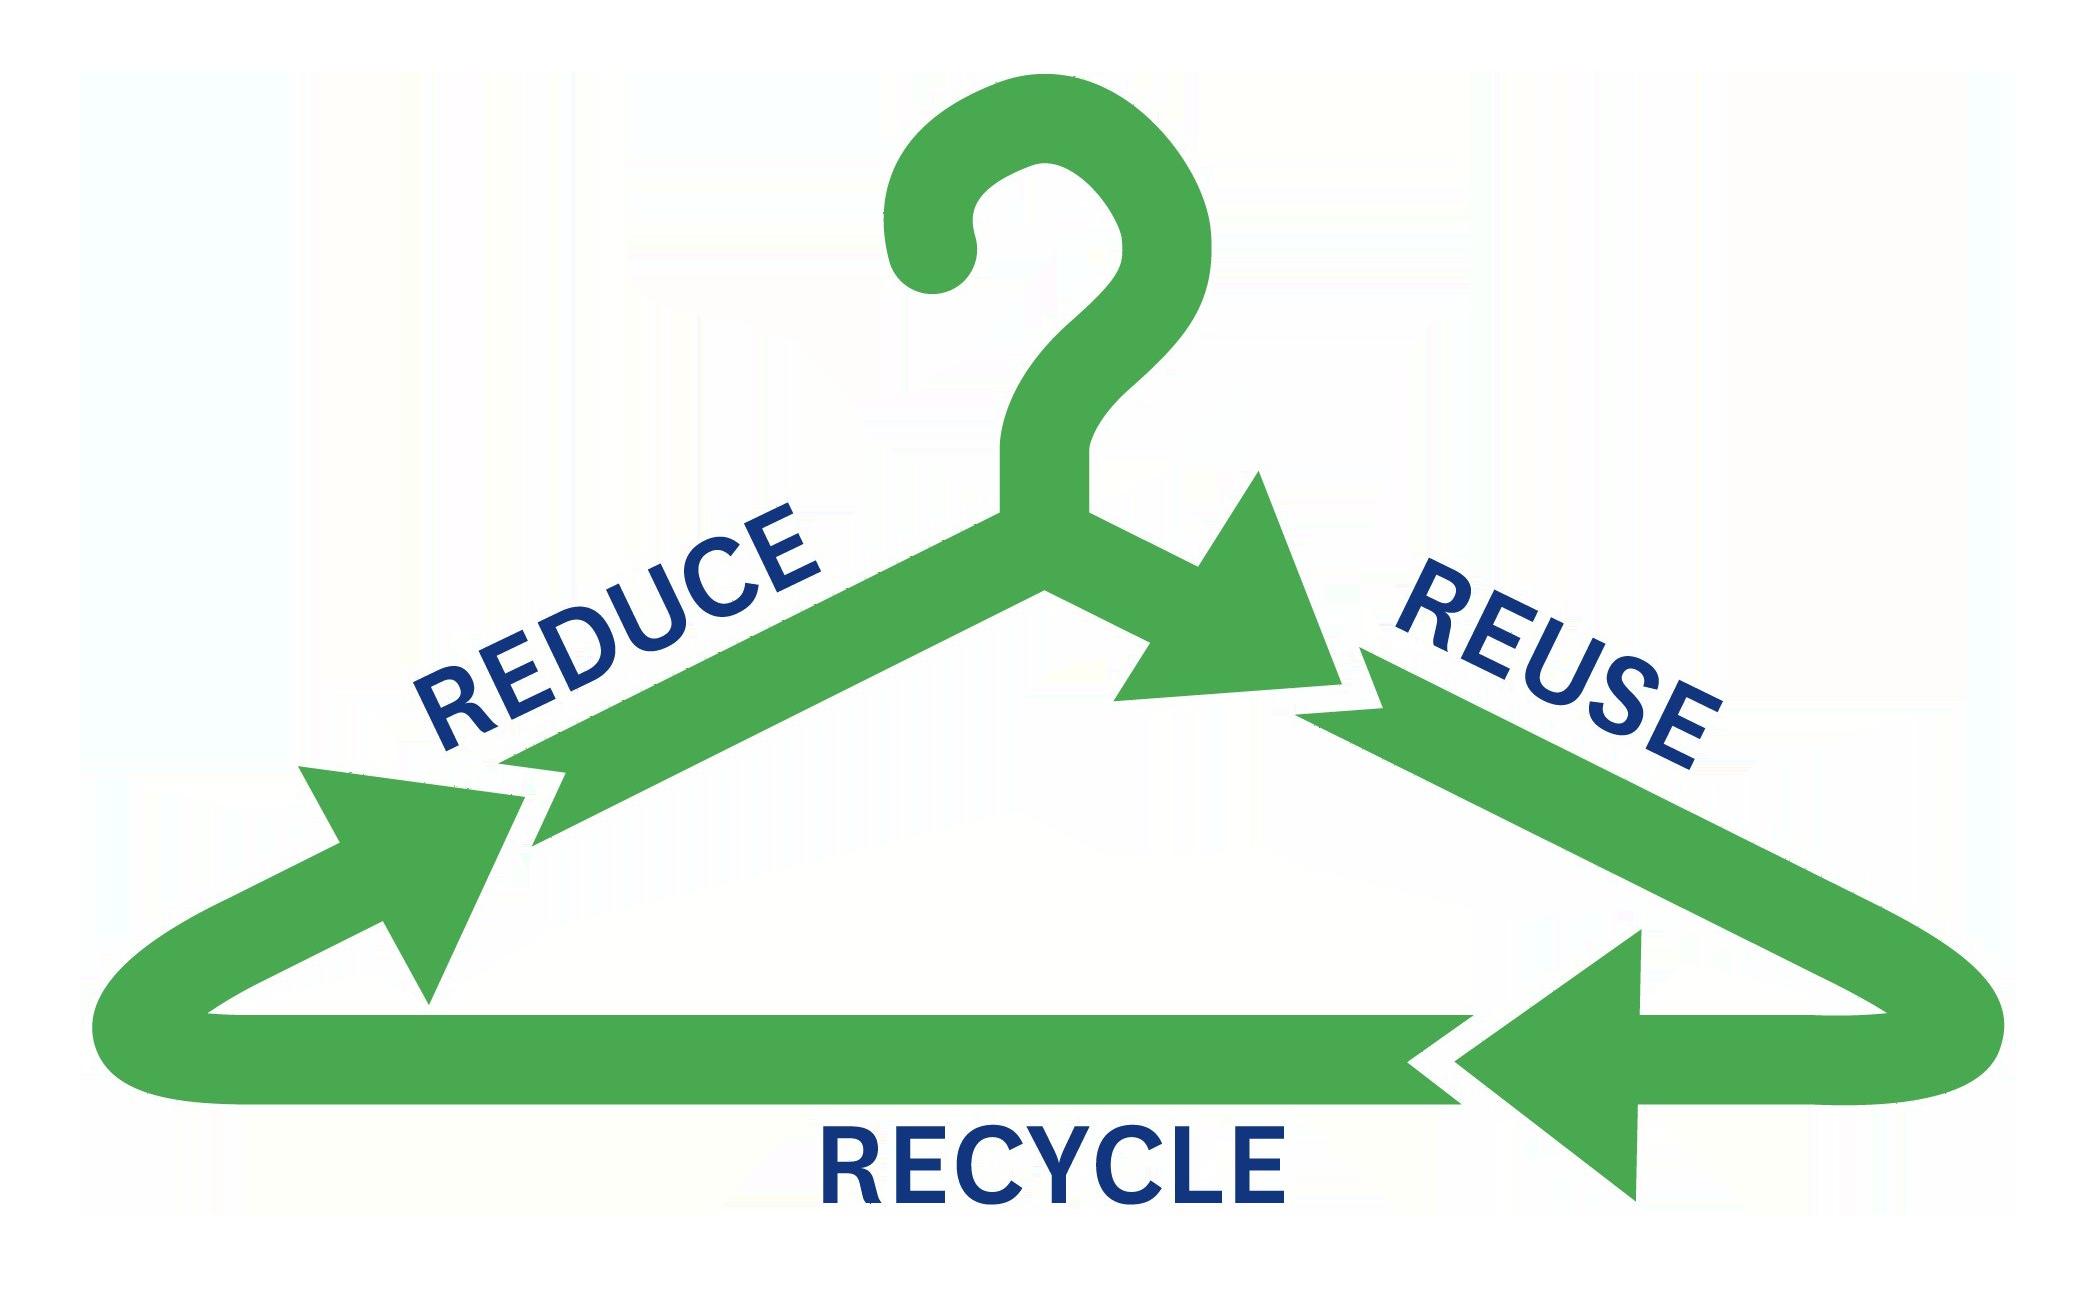 Hangers-Reuse-Recycle-Reduce